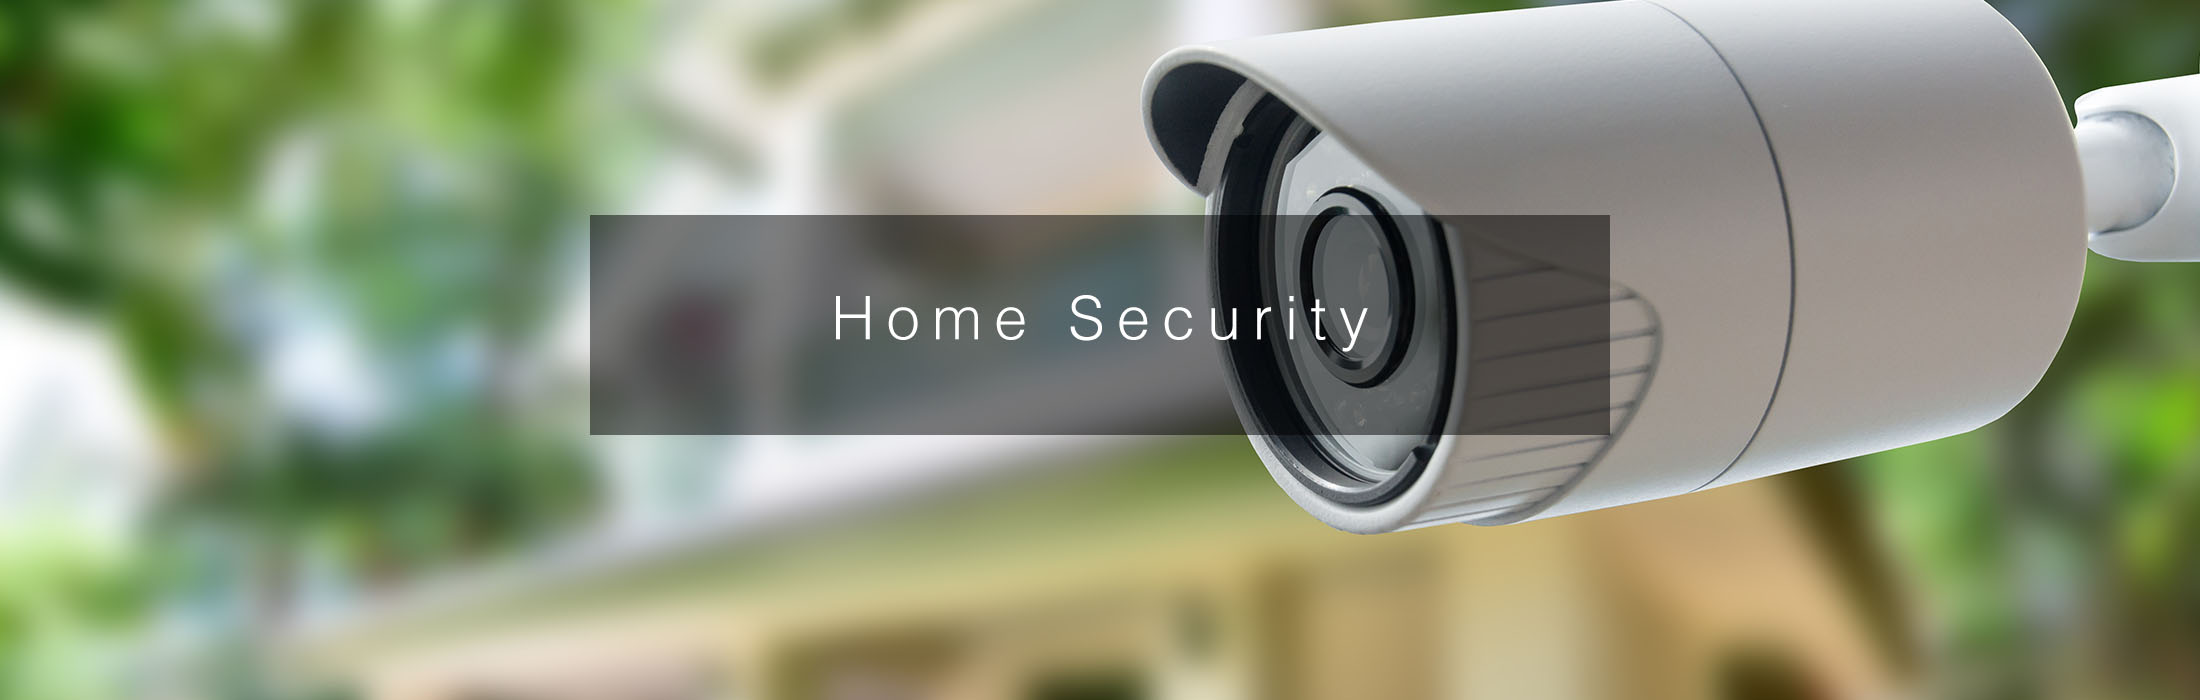 Drapinski TV - Home Security | Drapinski TV